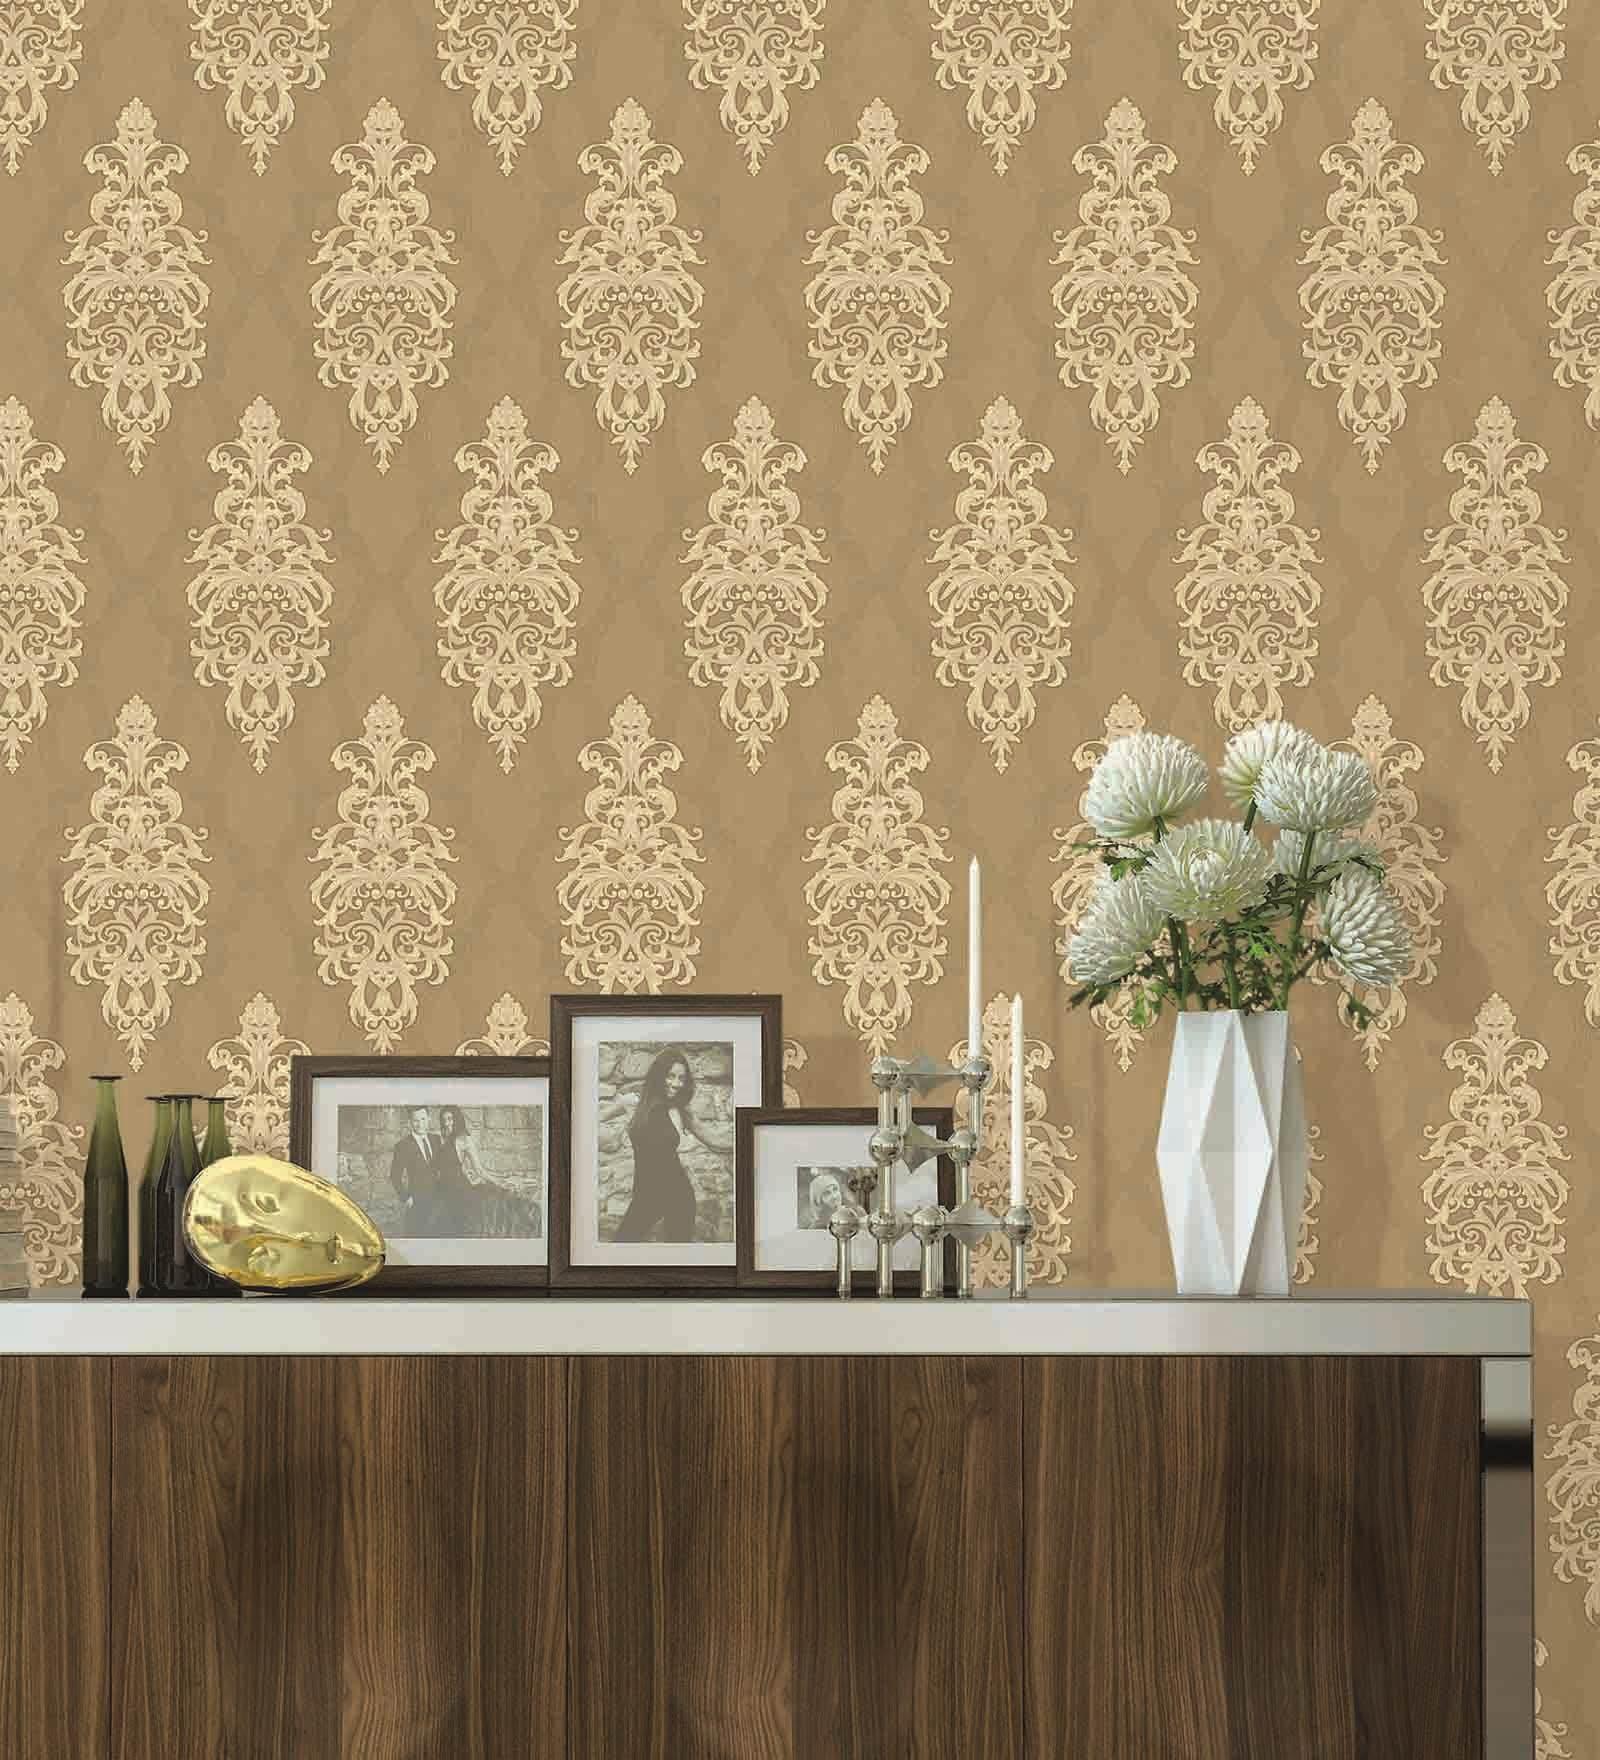 Golden PVC 394 x 21 Inch Wallpaper by Presto